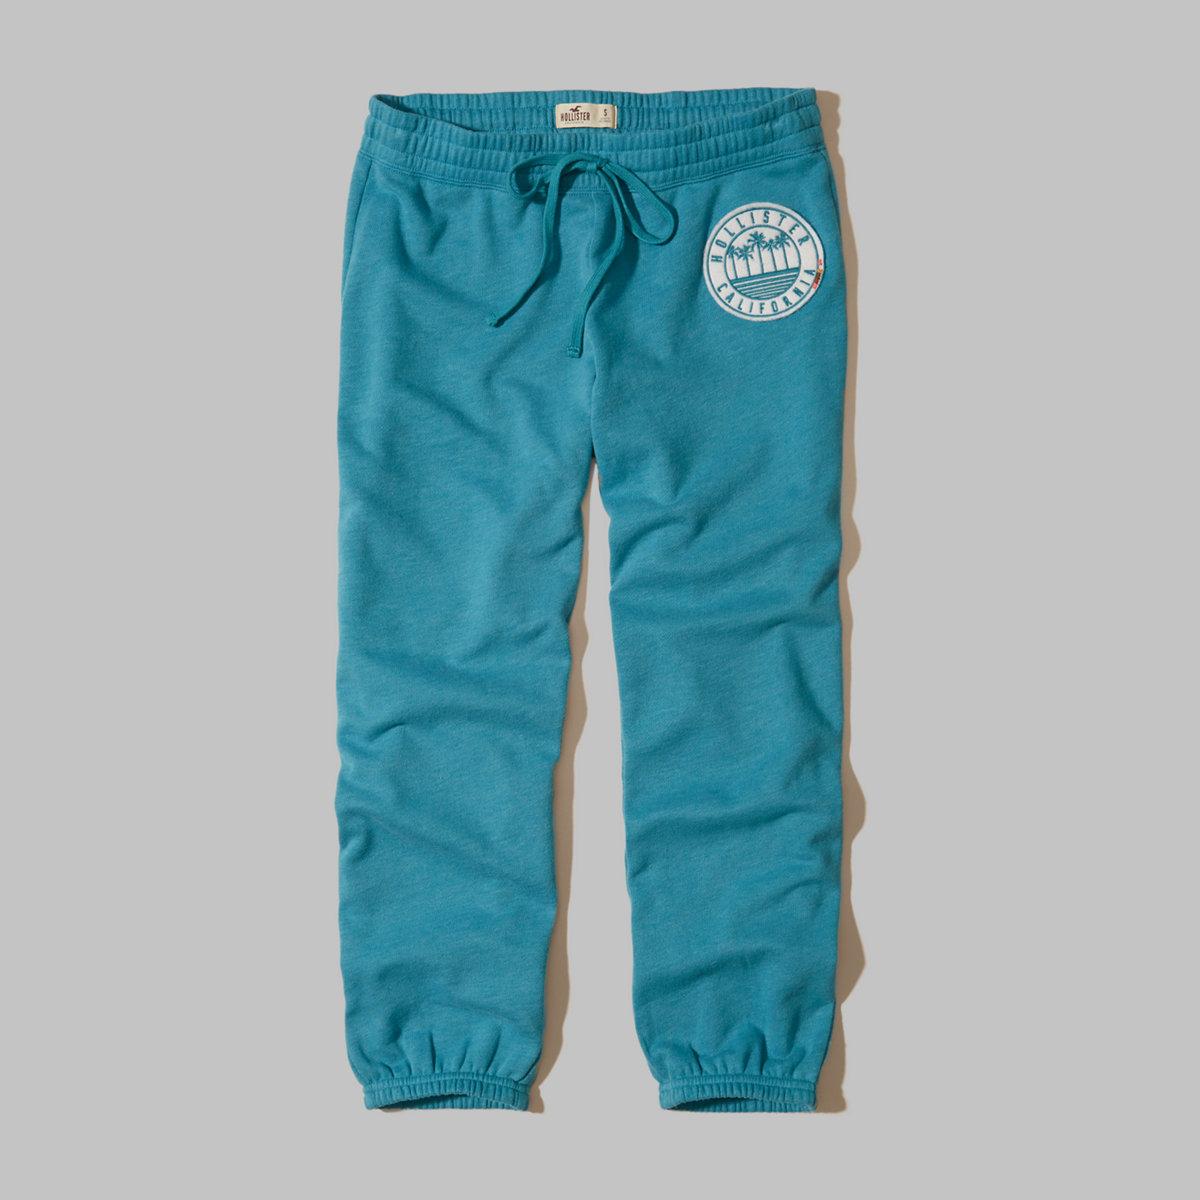 Graphic Crop Banded Sweatpants